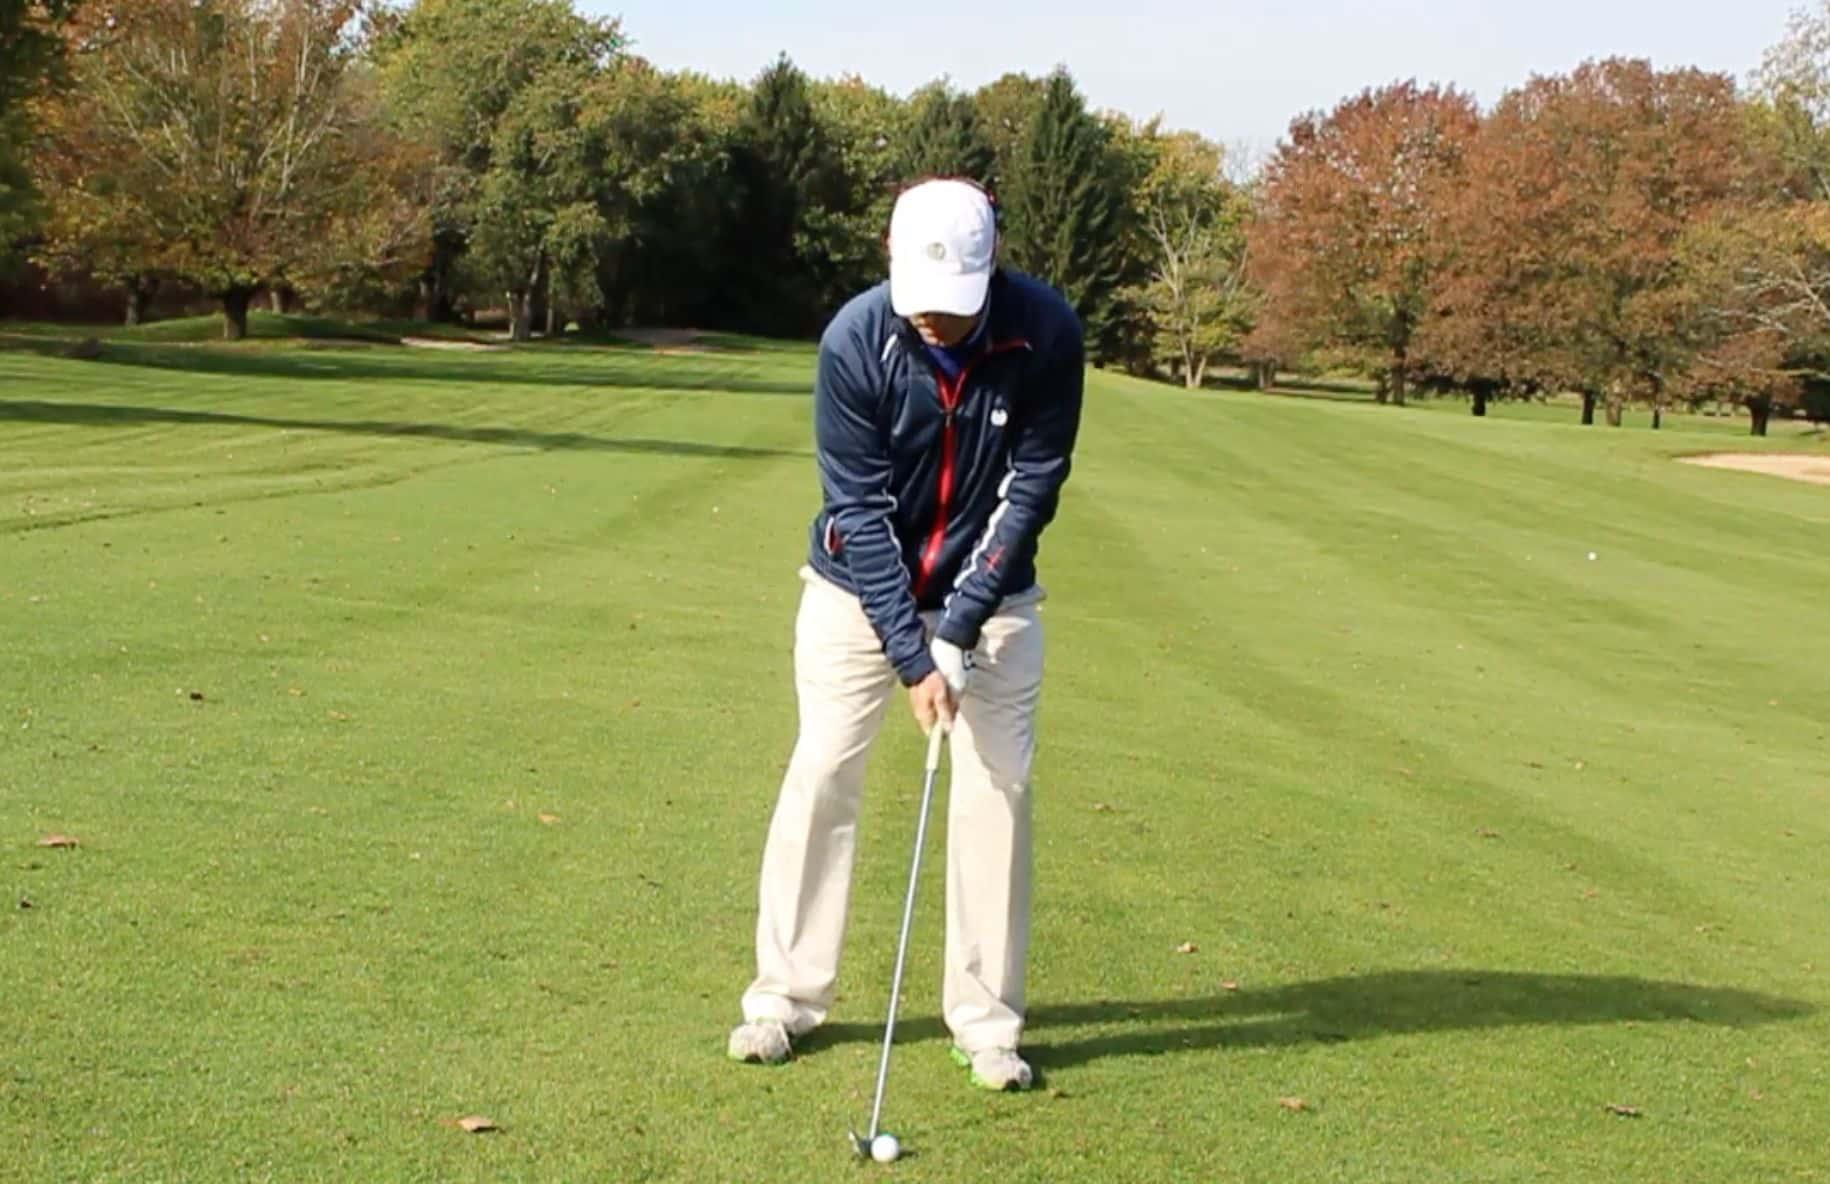 the correct ball position